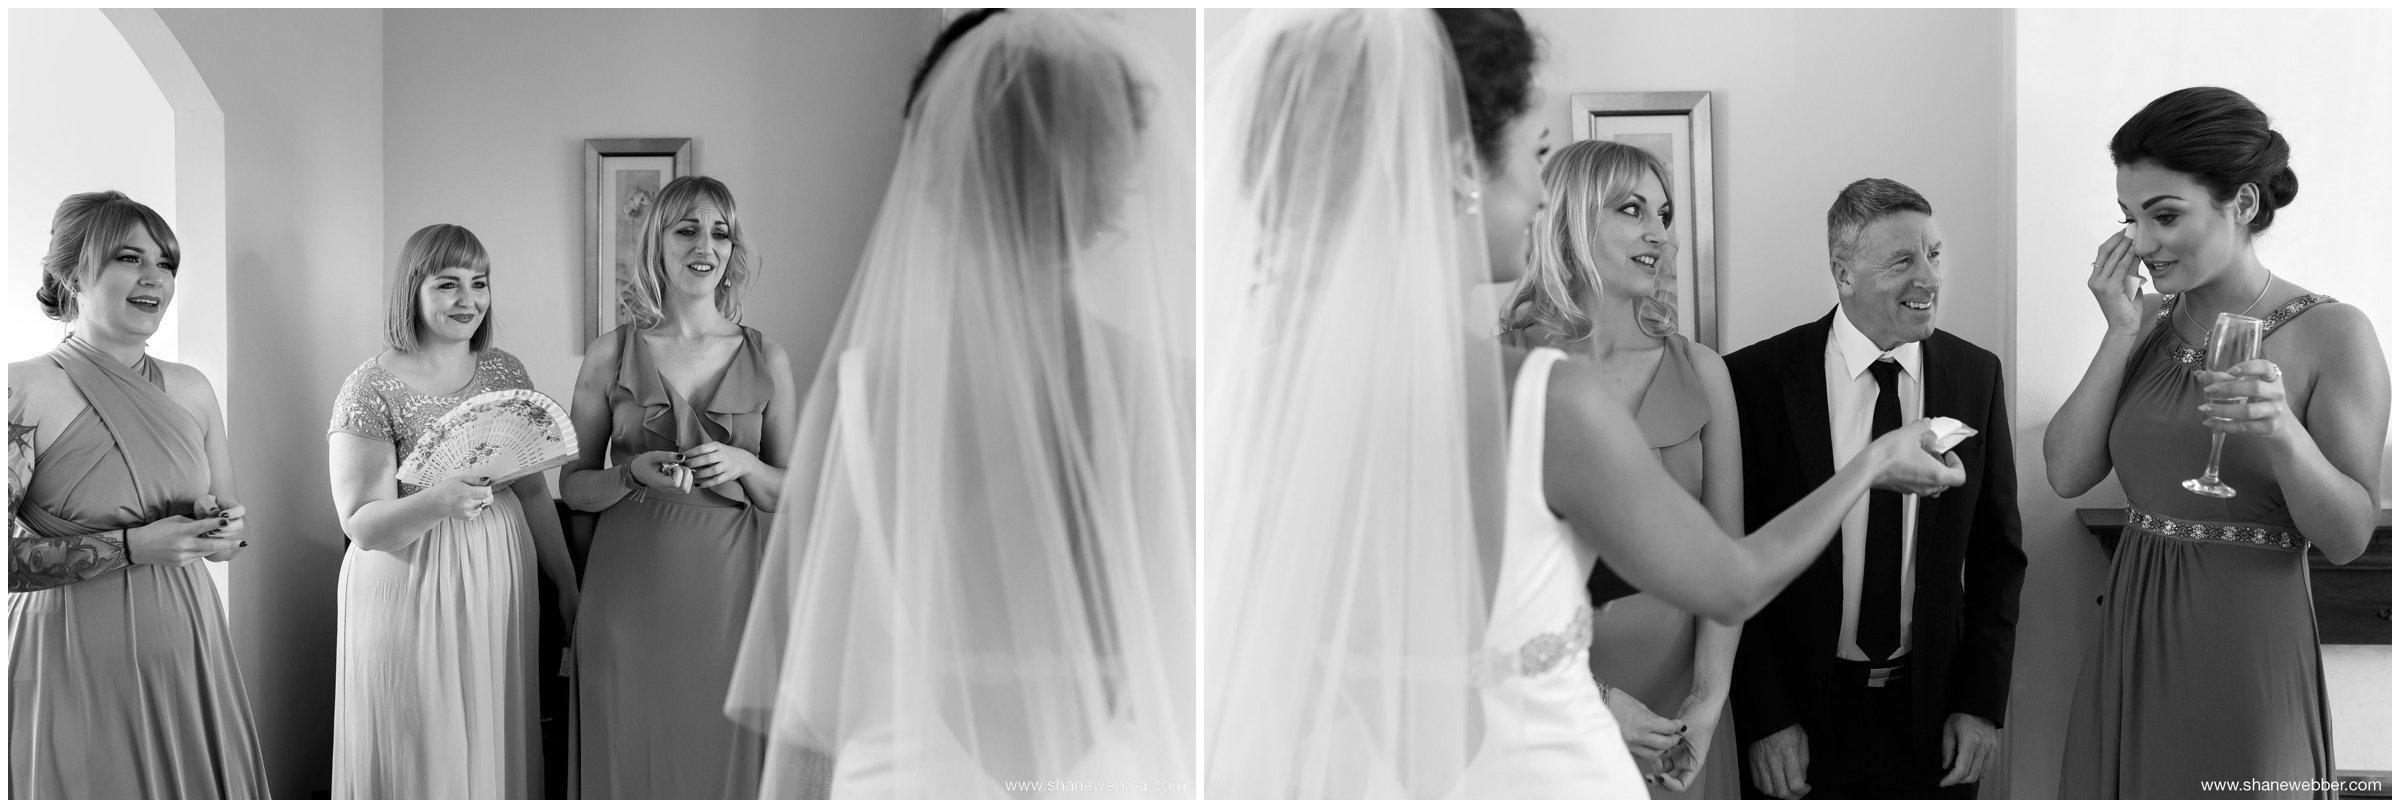 Black and white photo of bride